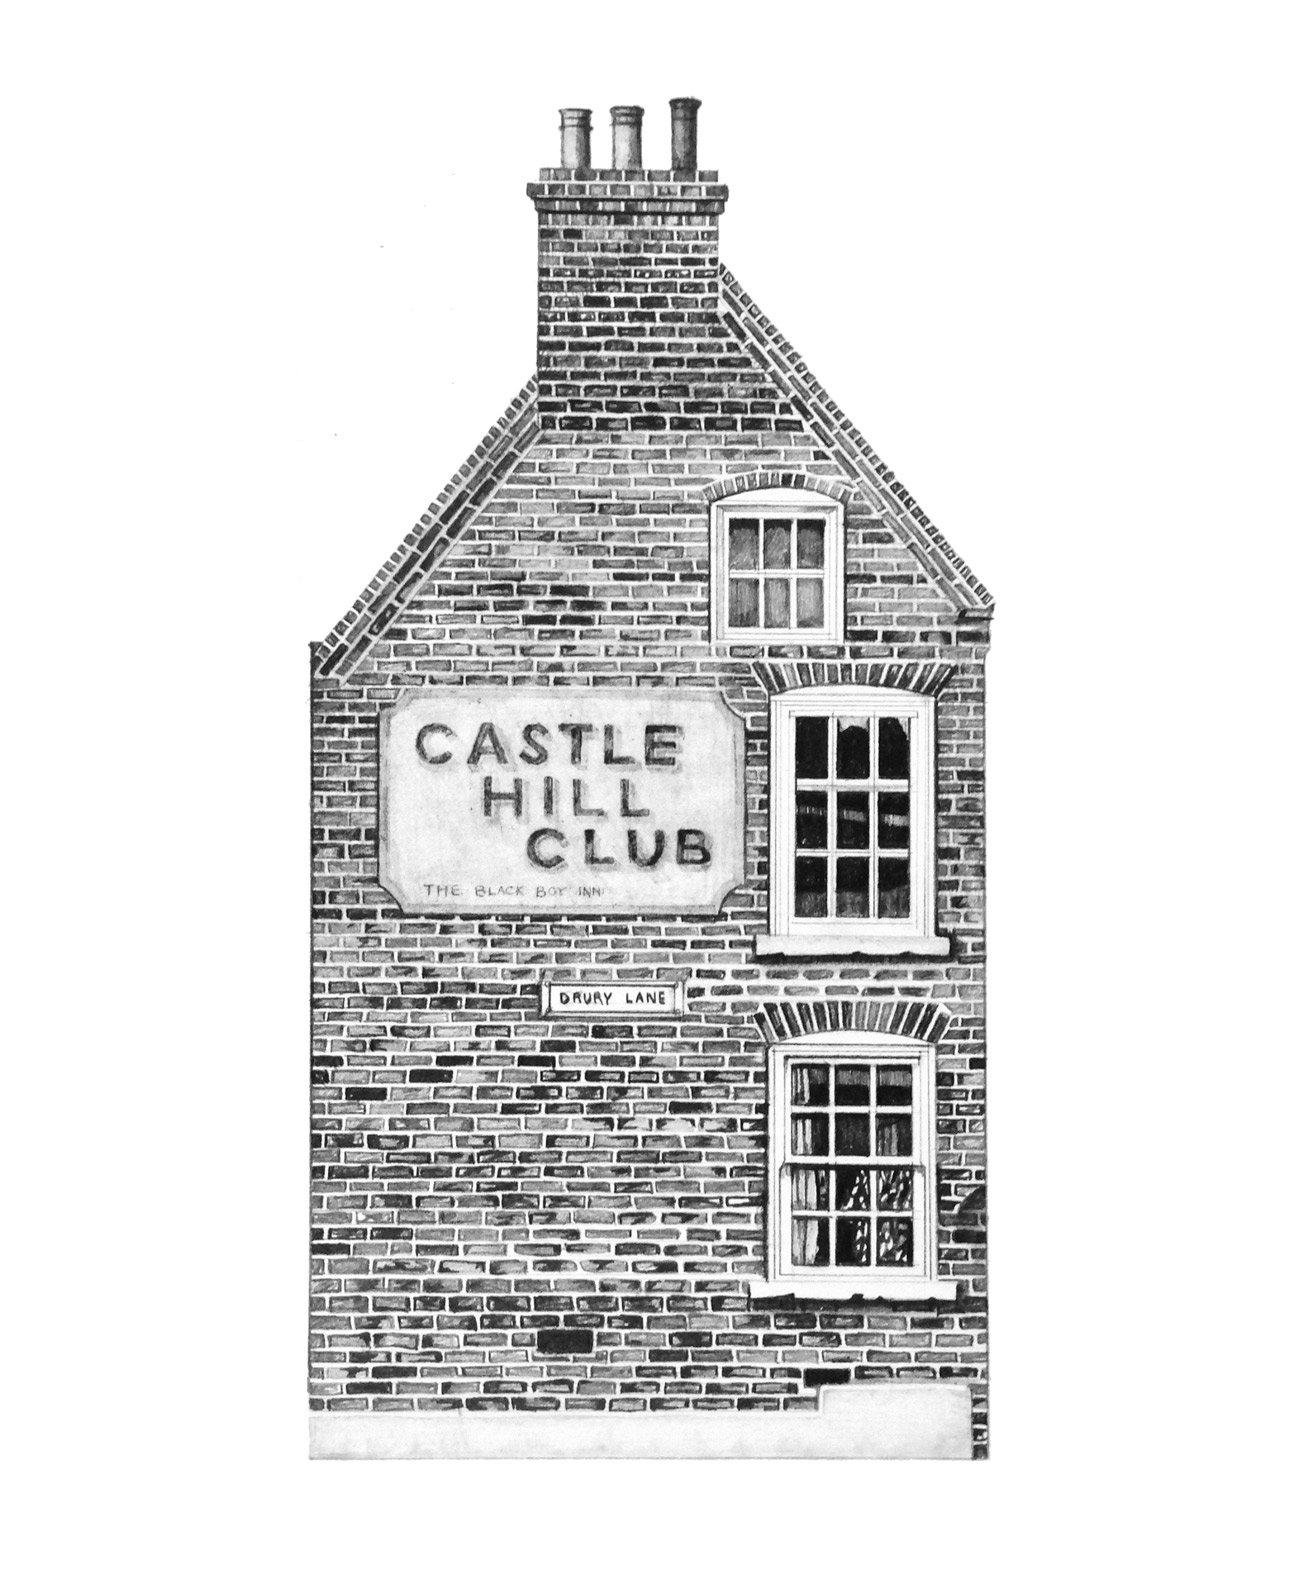 ArtStory MintySainsbury lincoln castle hill clubfacade large web